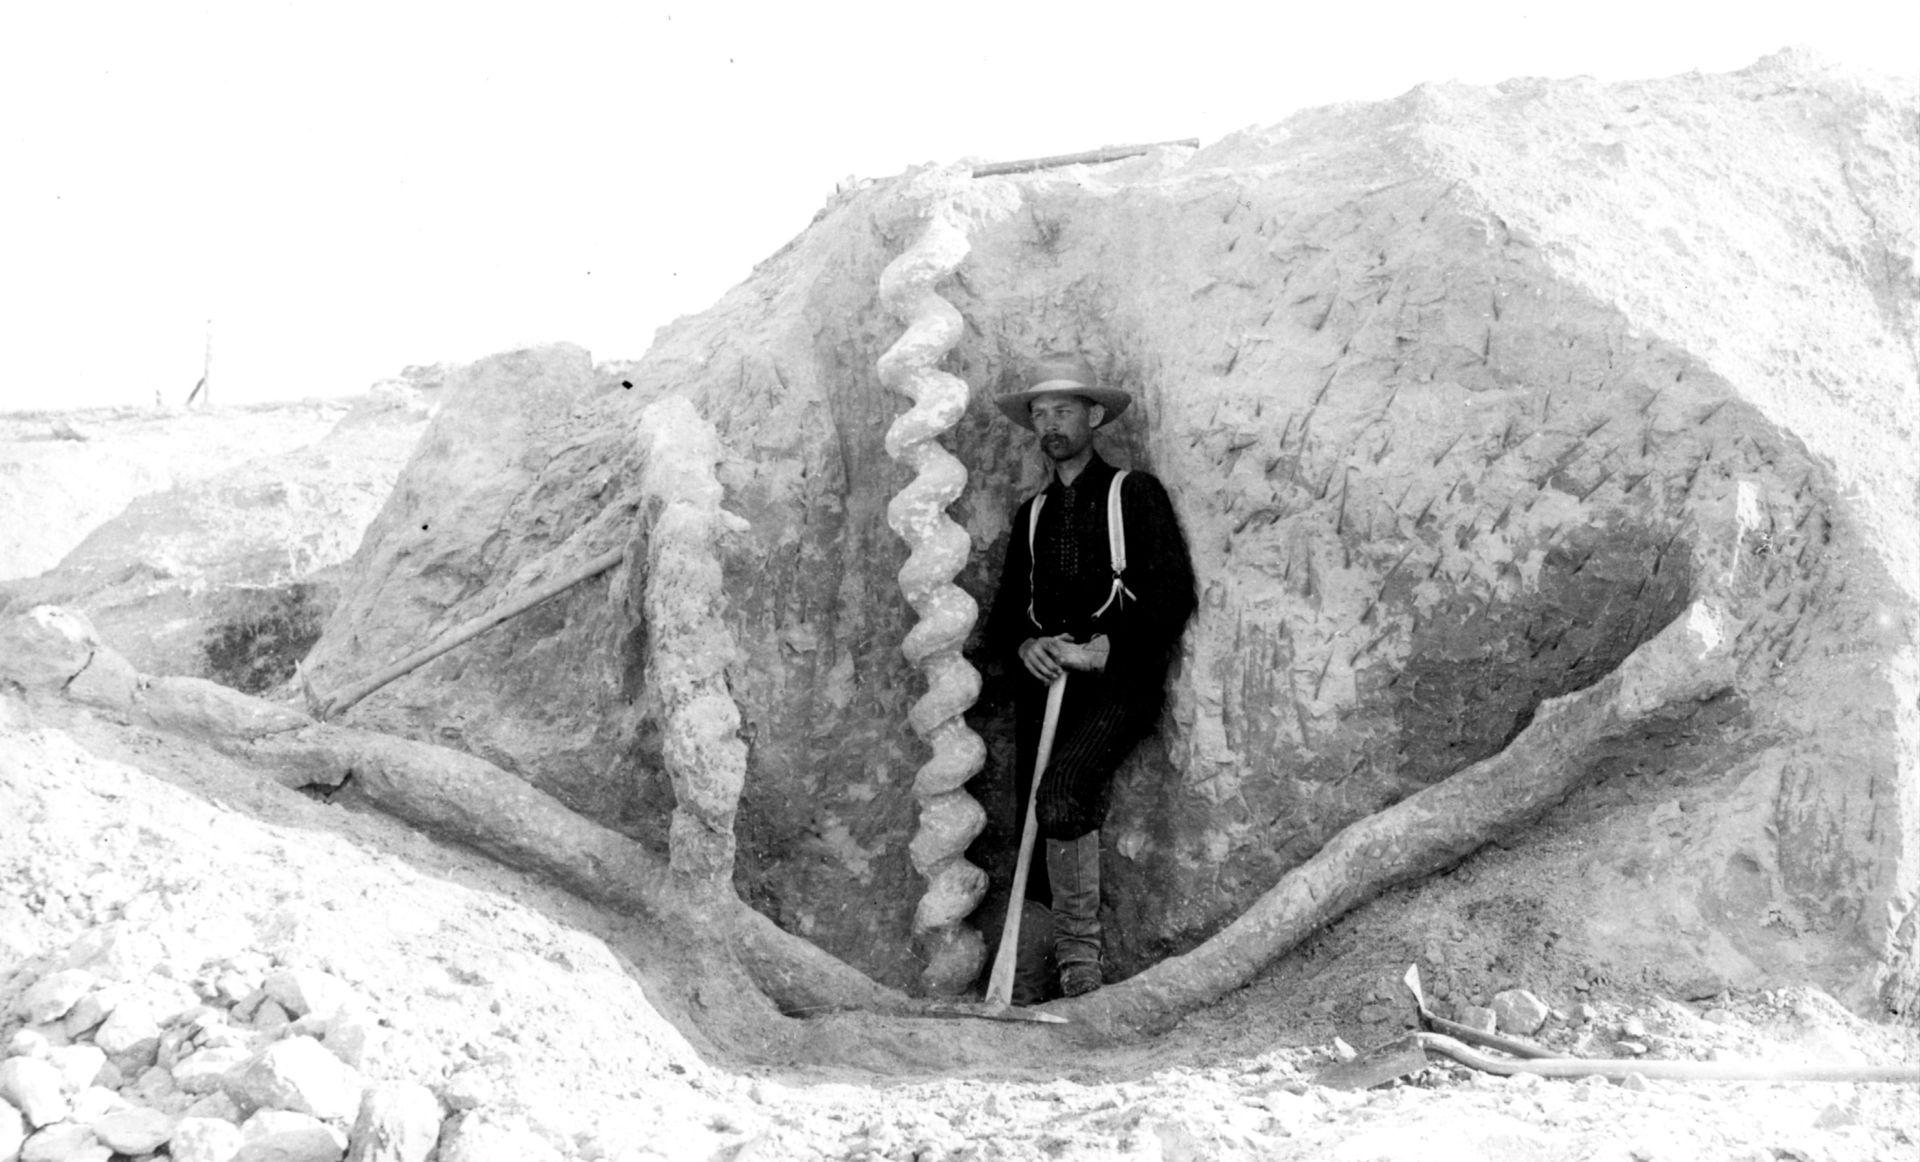 The Daemonelix In Nebraska Are One Of History S Oddest Wonders